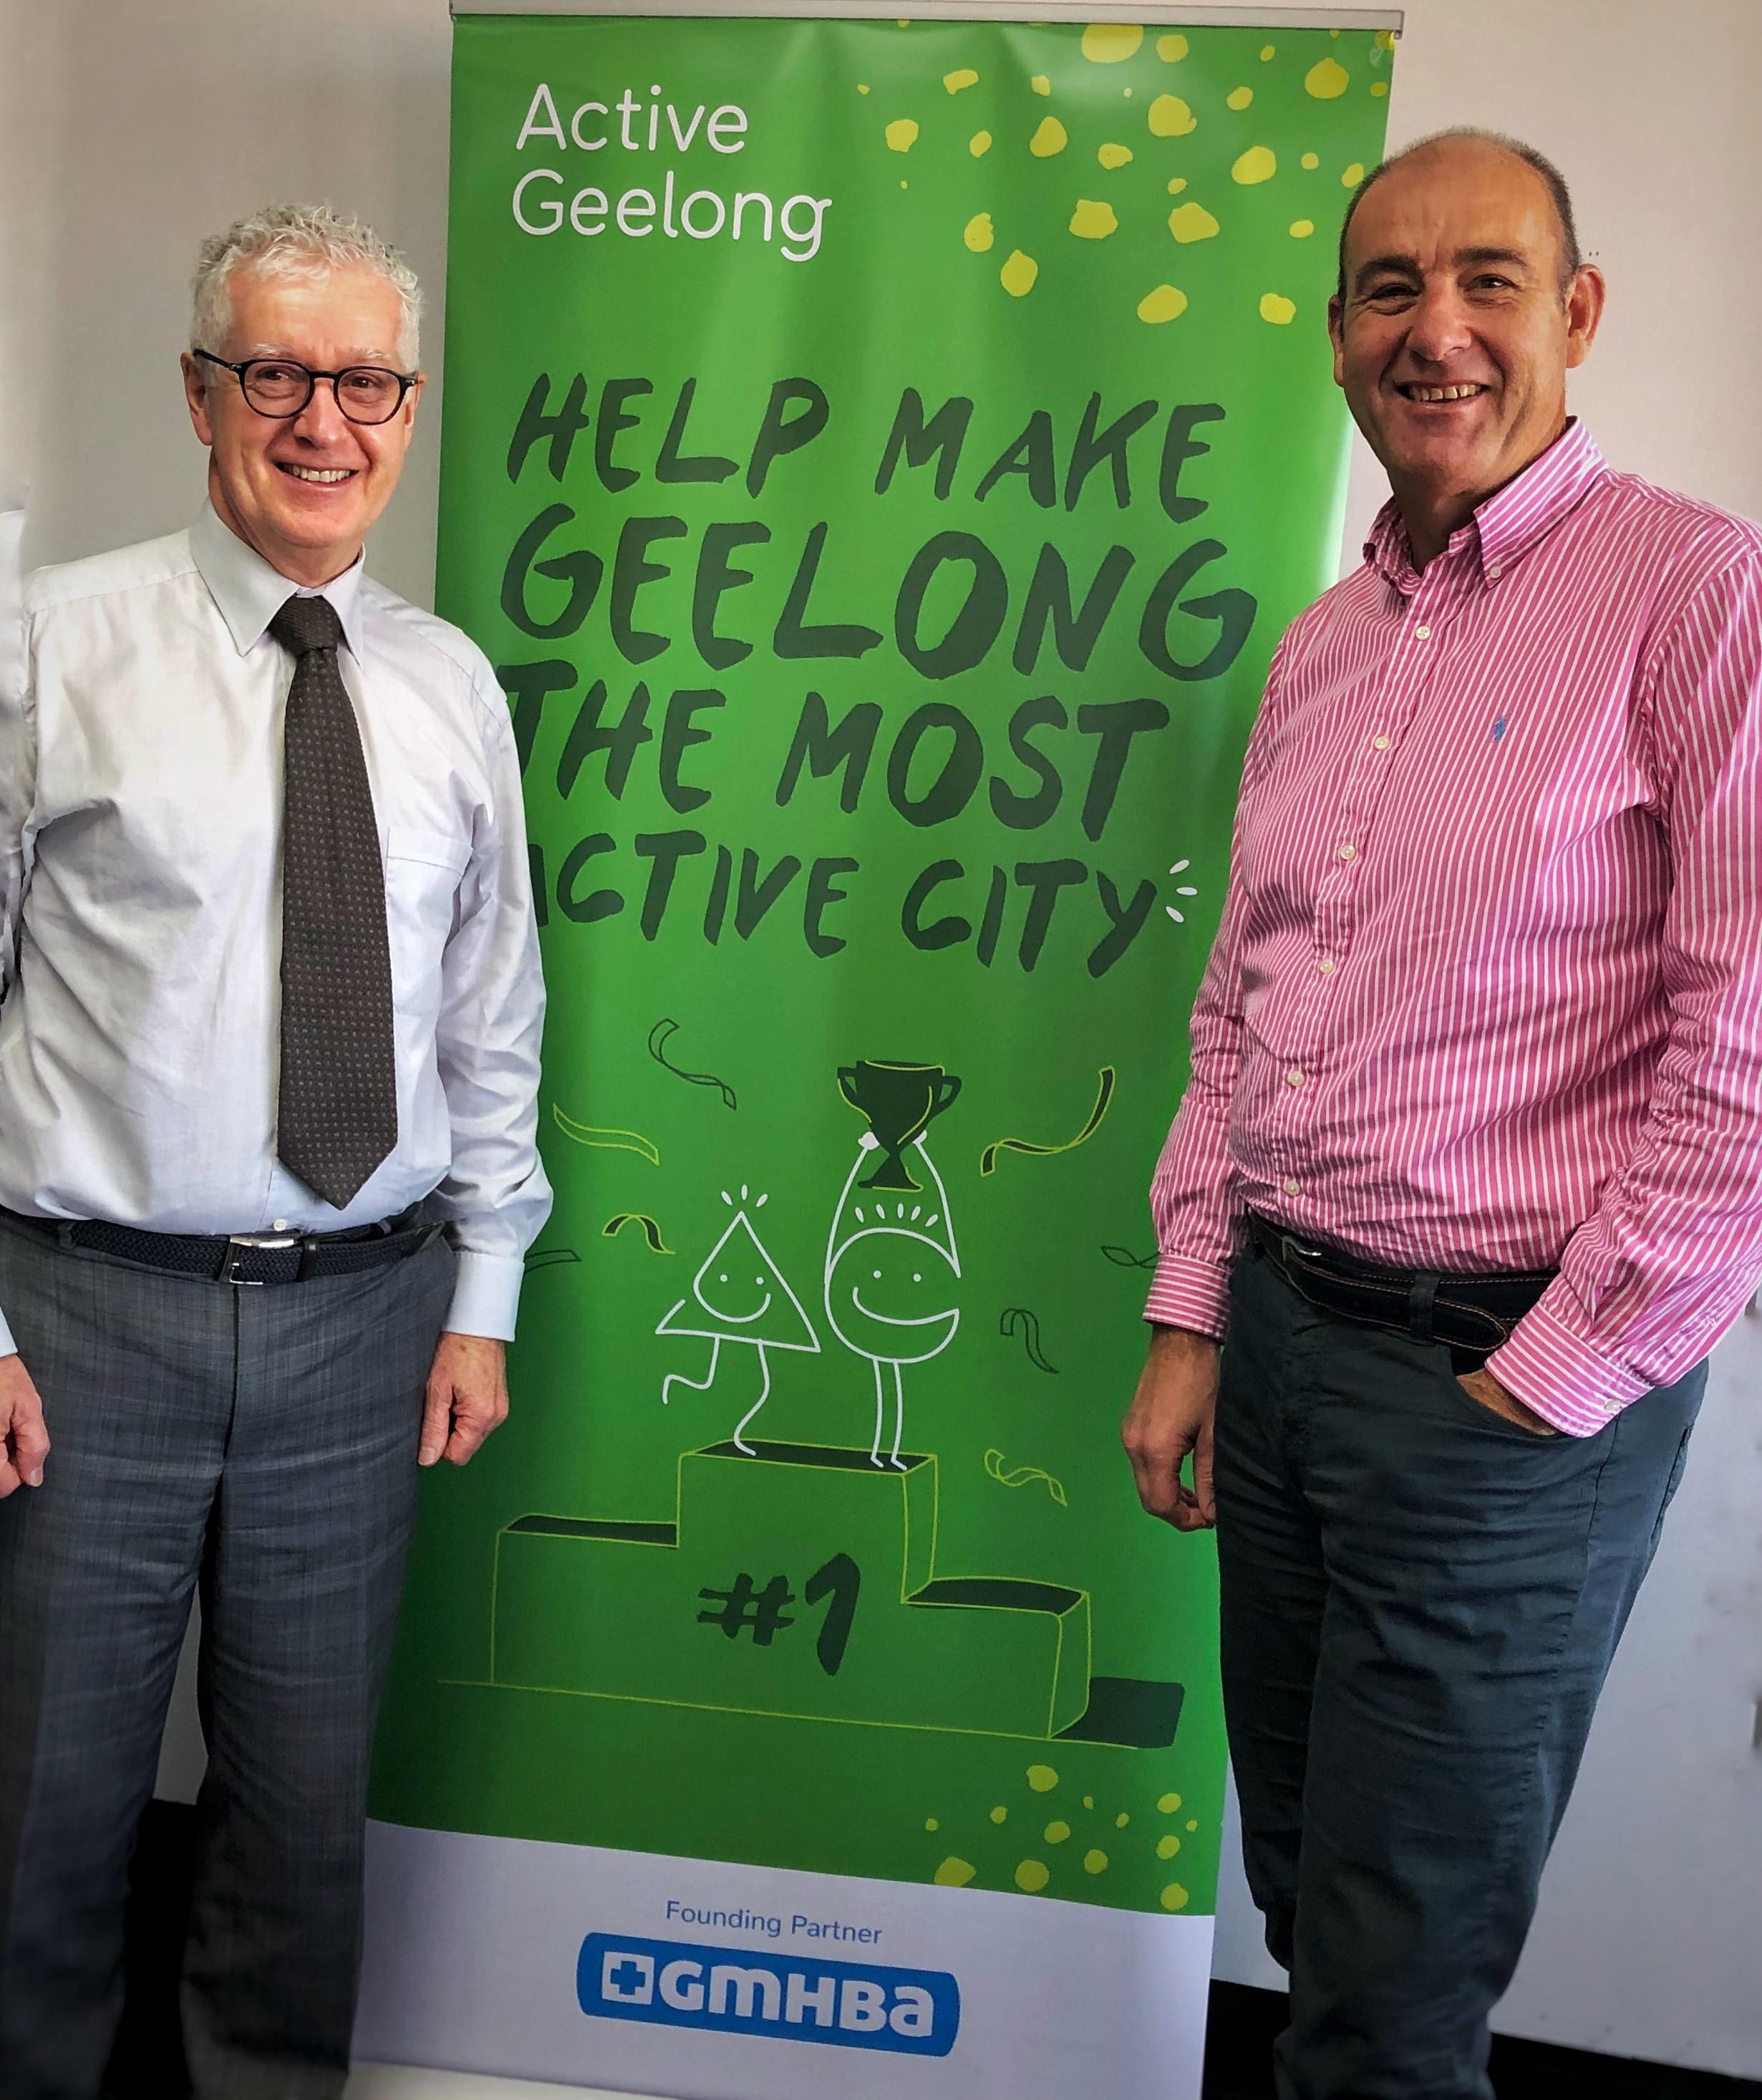 Active Geelong chair Dr Hugh Seward with GMHBA CEO Mark Valena